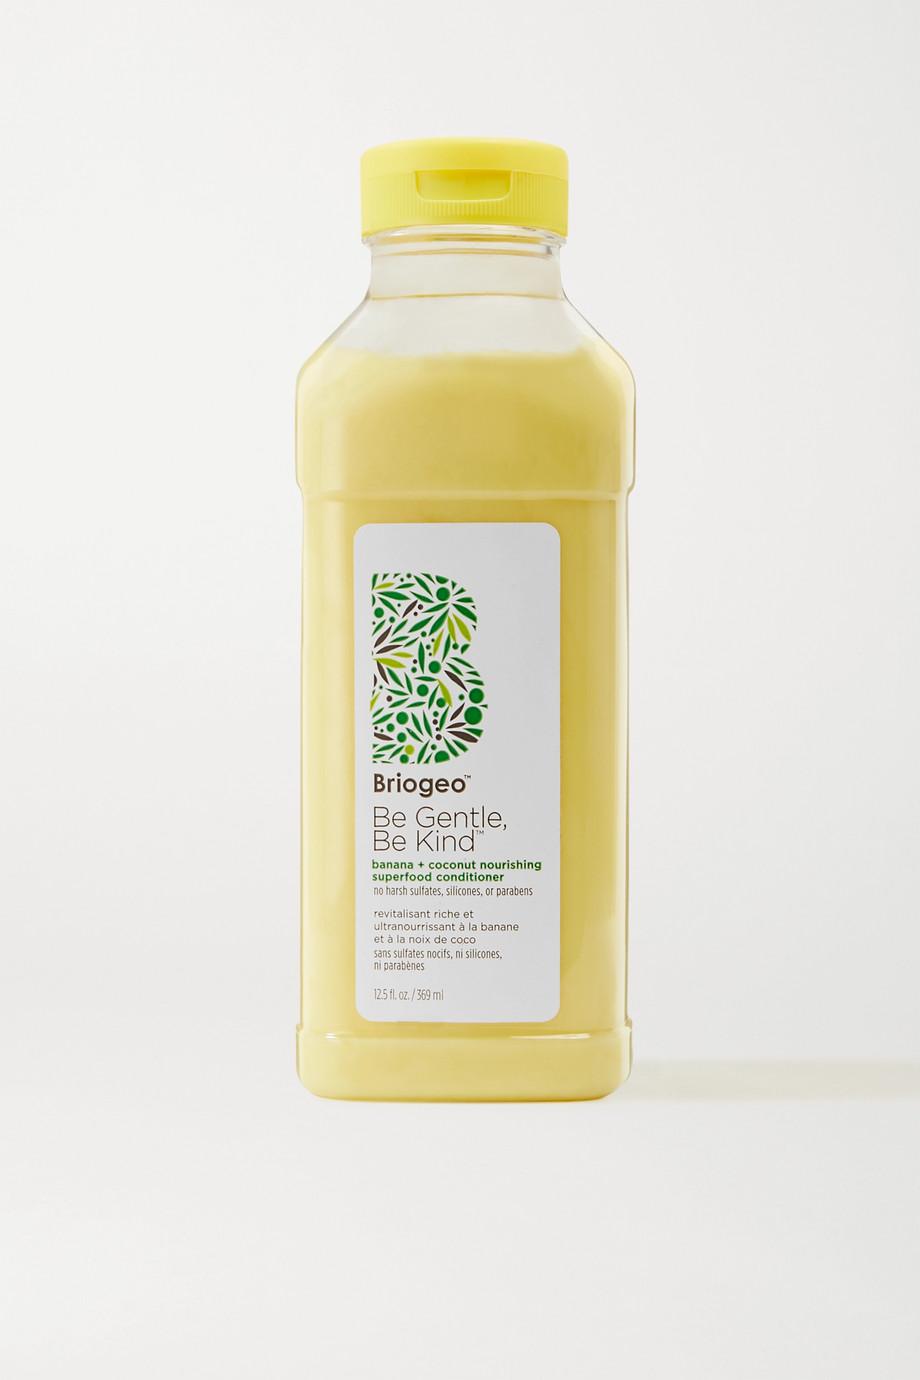 Briogeo Be Gentle, Be Kind Banana + Coconut Nourishing Superfood Conditioner, 369 ml – Conditioner